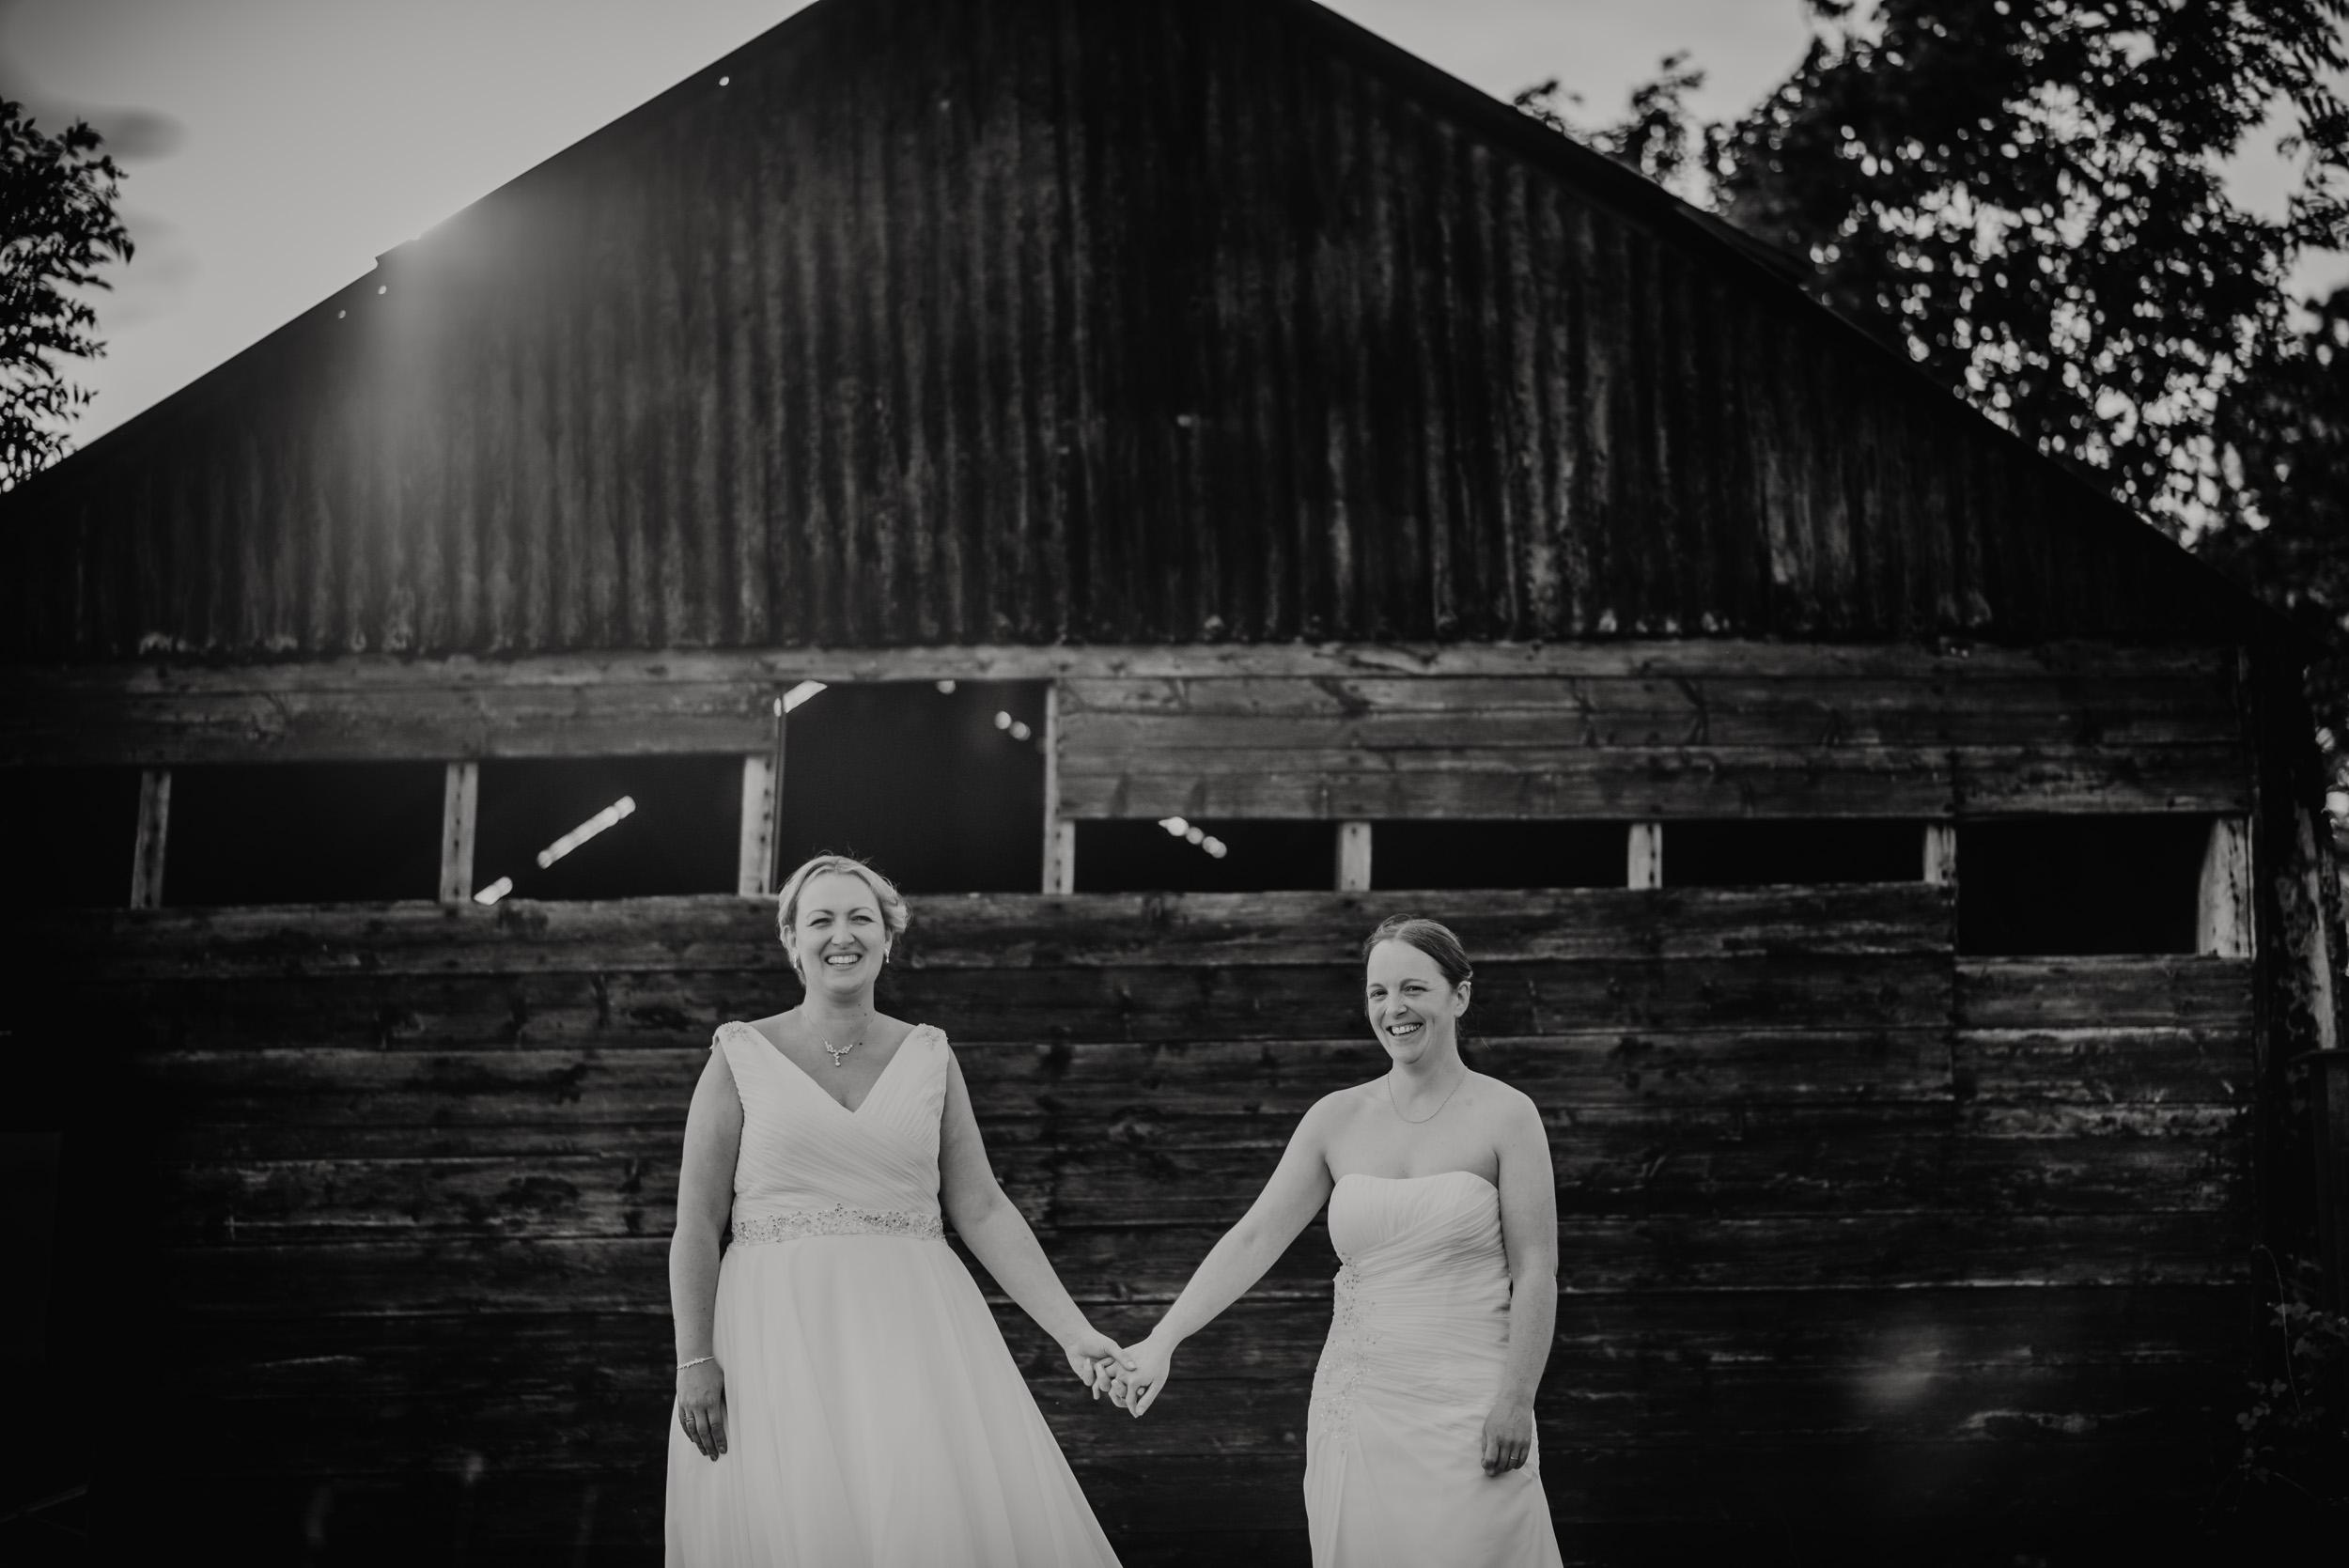 Donington-park-farm-wedding-photography-639.jpg